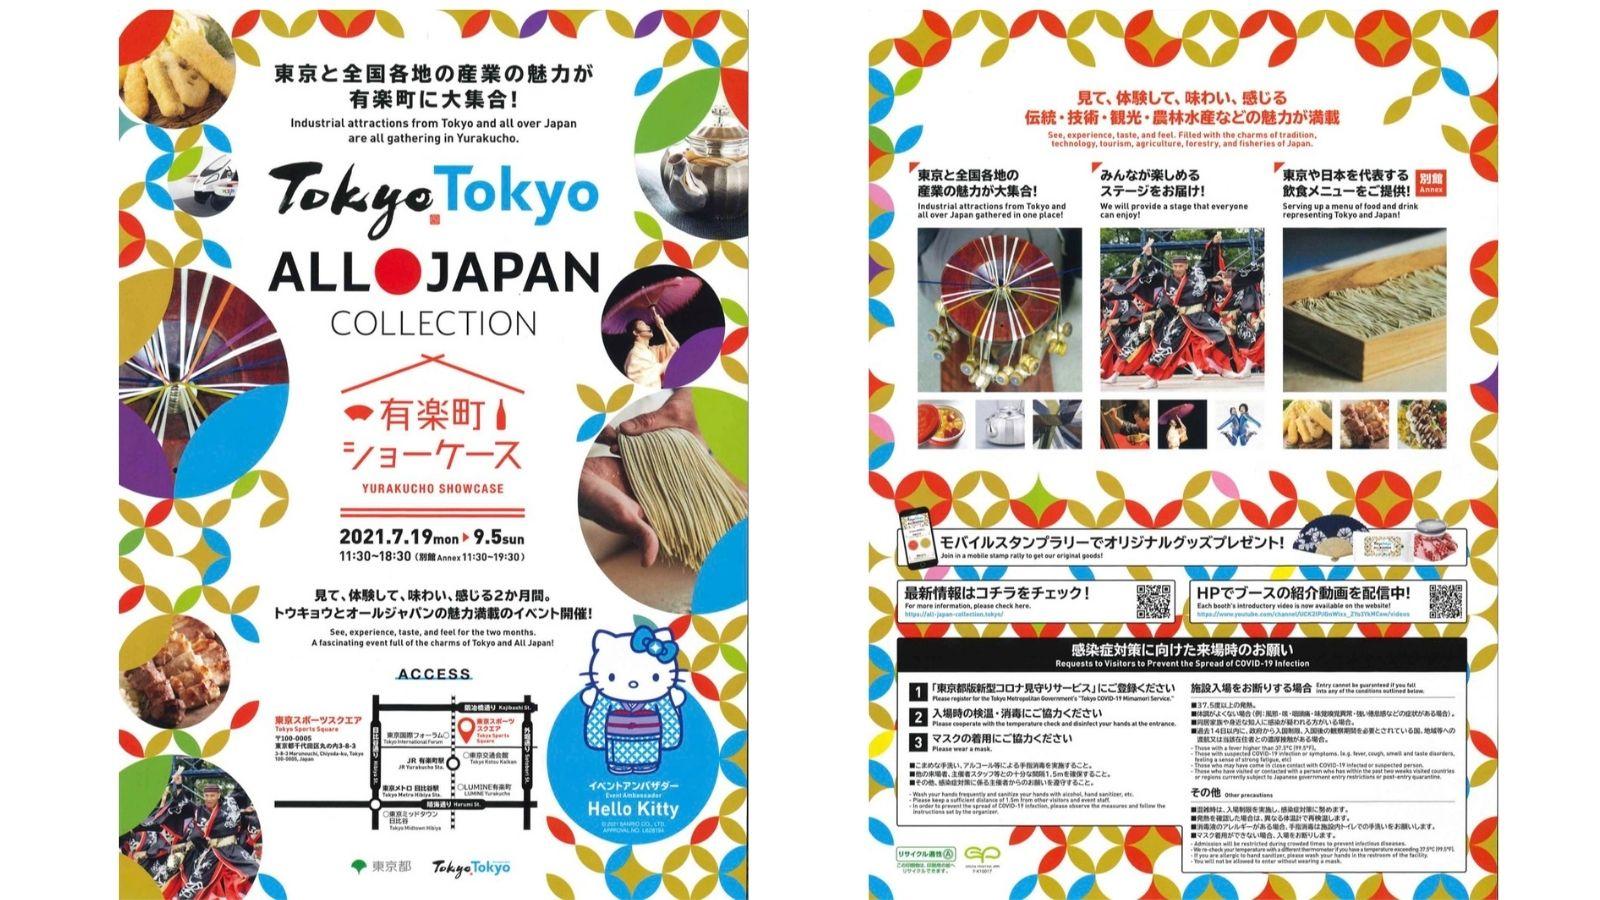 TOKYOTOKYO ALL JAPAN COLLECTION オリンピック パラリンピック